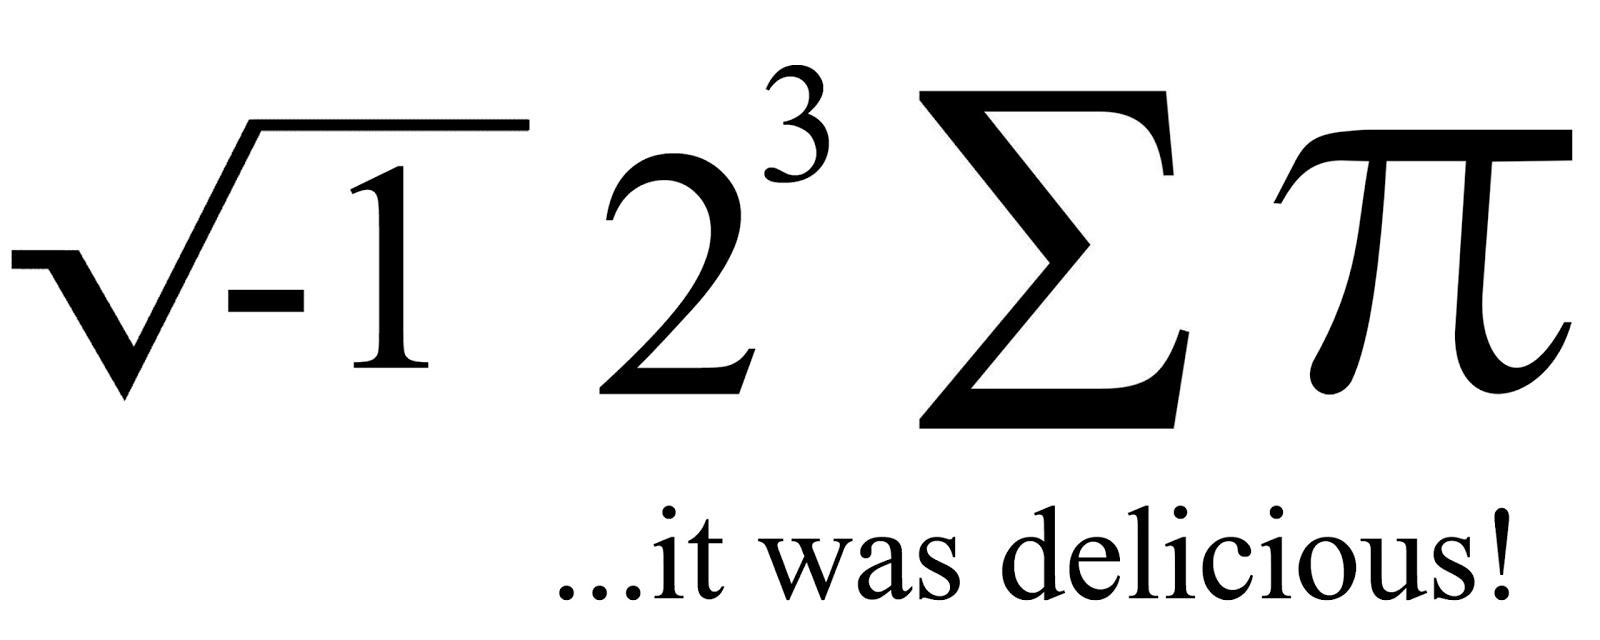 Doodlecraft: National Pi Day Funny Math Geek Shirt!